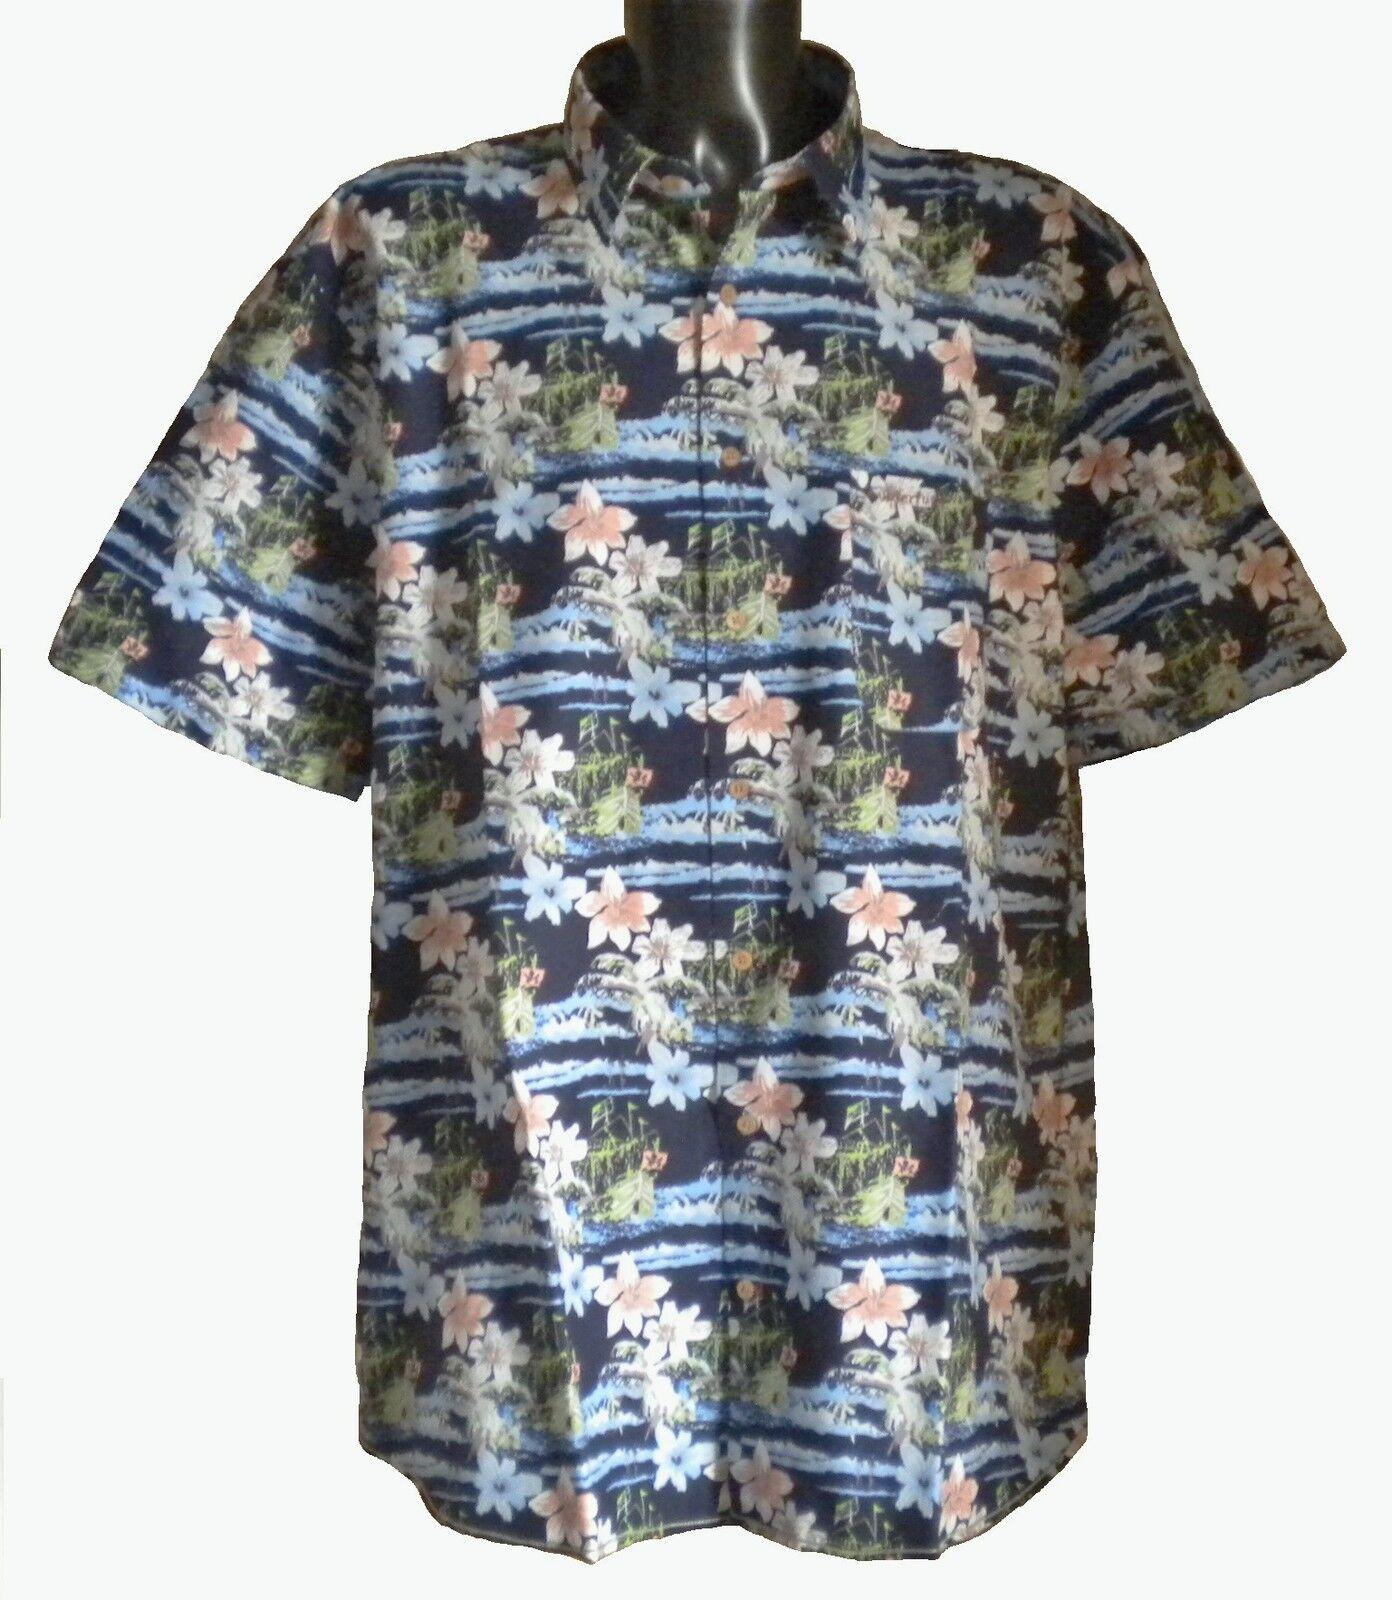 NEW Mens Big Size Espionage Floral Hawaiian Shirt 3XL 4XL 5XL 6XL 7XL